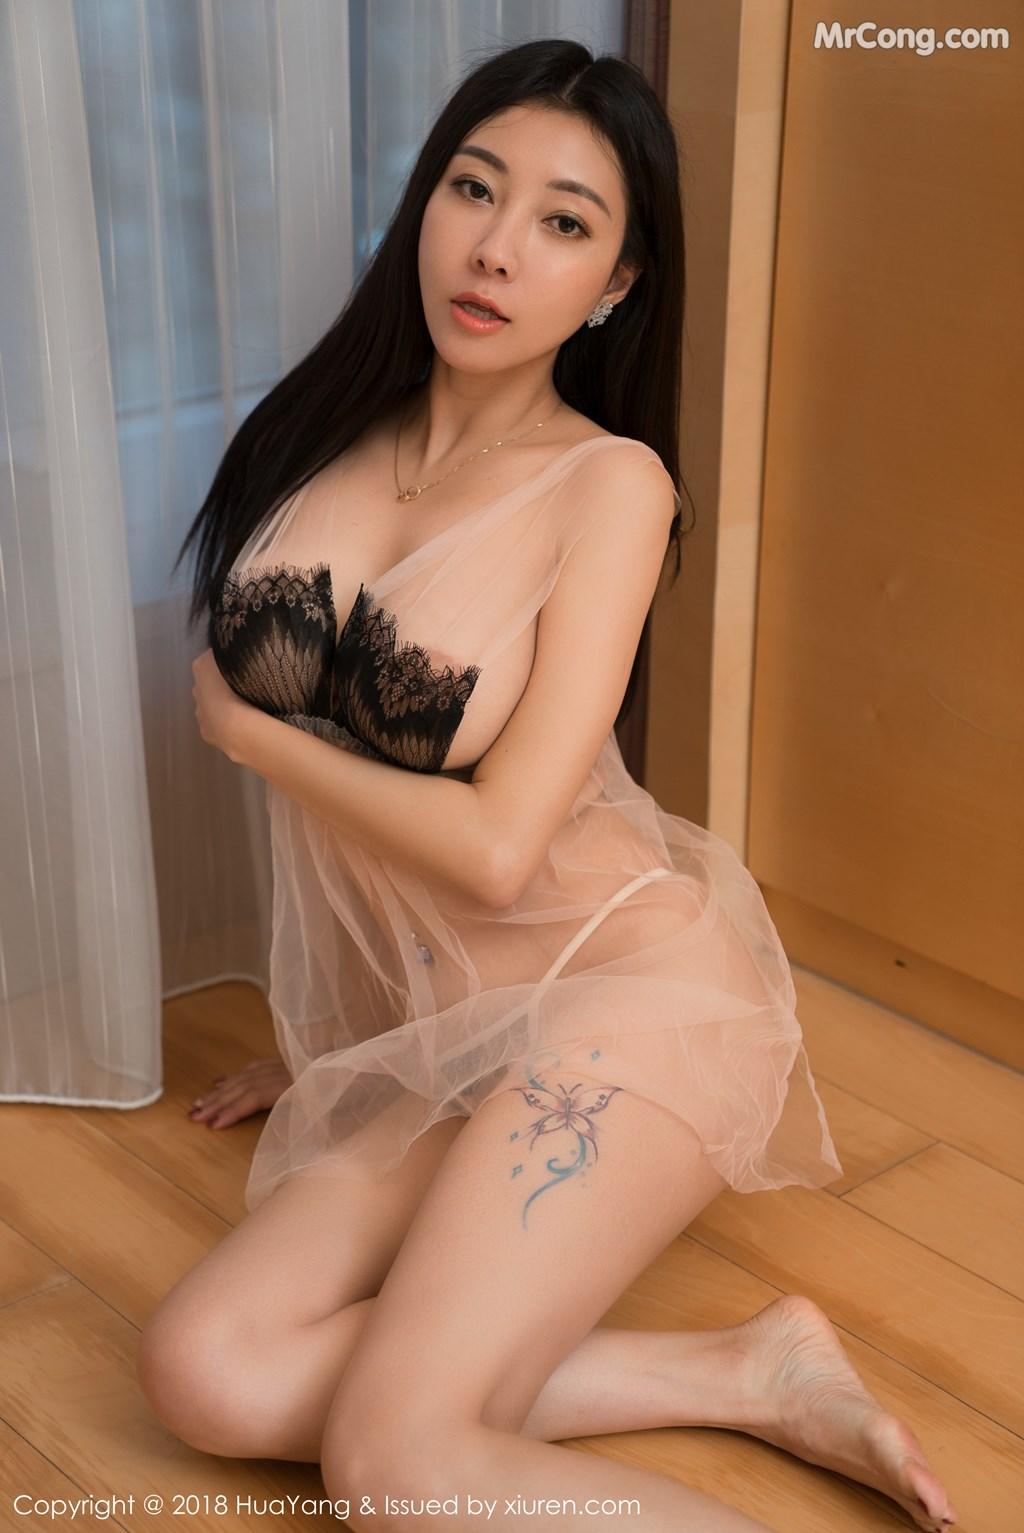 Image HuaYang-2018-01-26-Vol.028-Victoria-Guo-Er-MrCong.com-002 in post HuaYang 2018-01-26 Vol.028: Người mẫu Victoria (果儿) (41 ảnh)